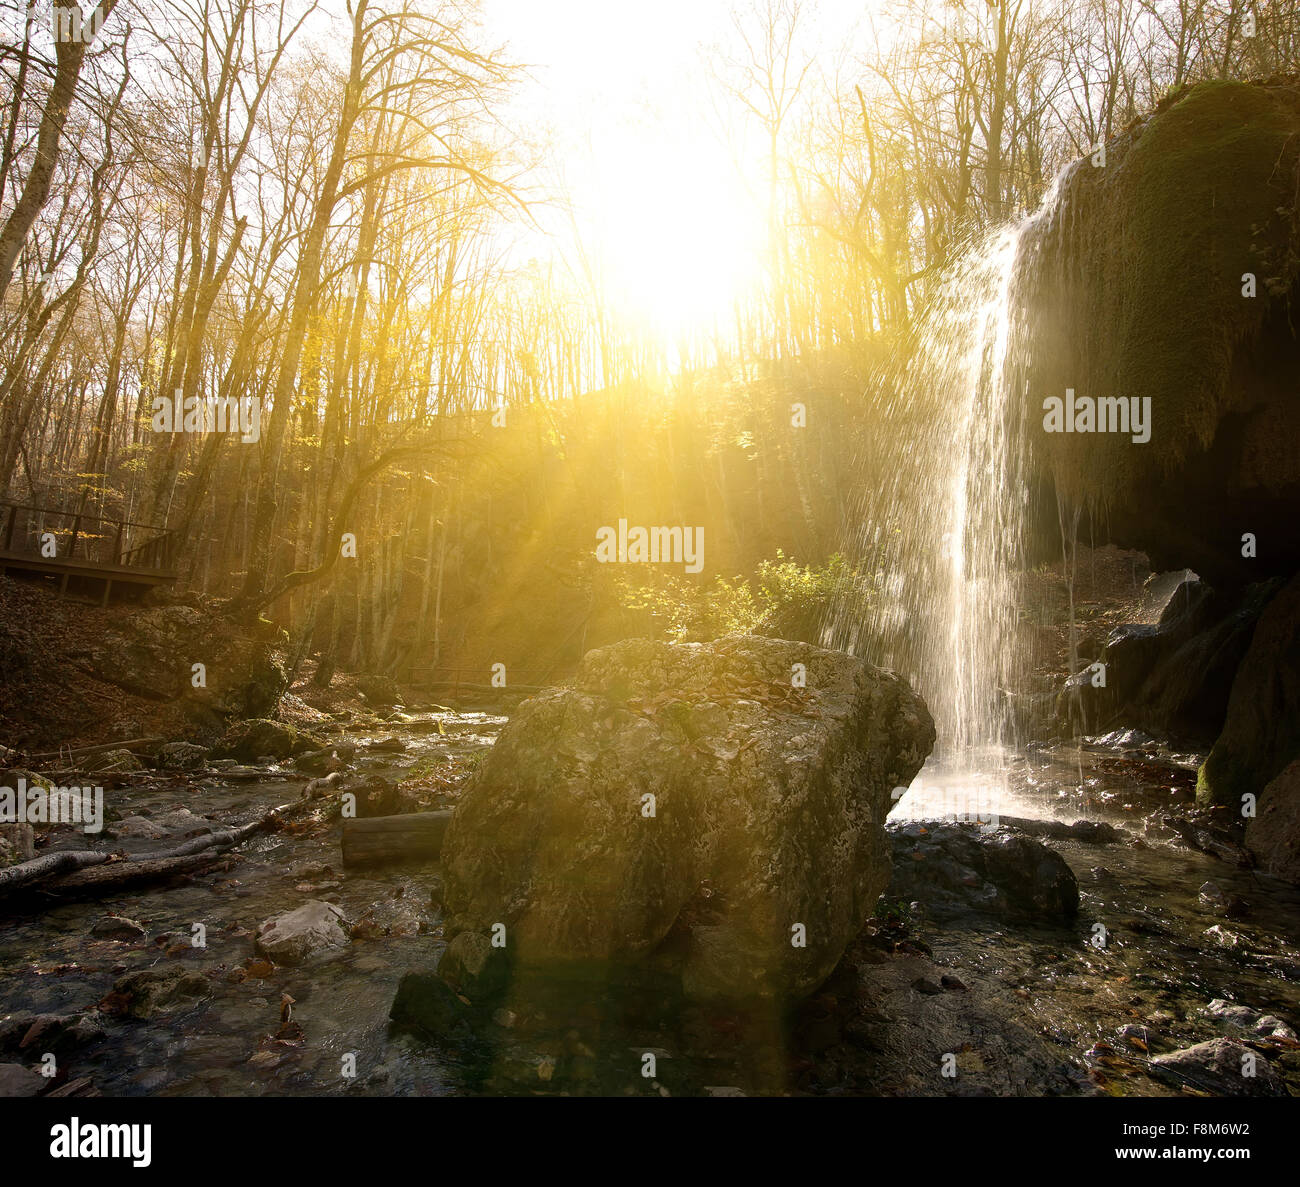 Wasserfall im Wald am sonnigen Morgen Stockbild